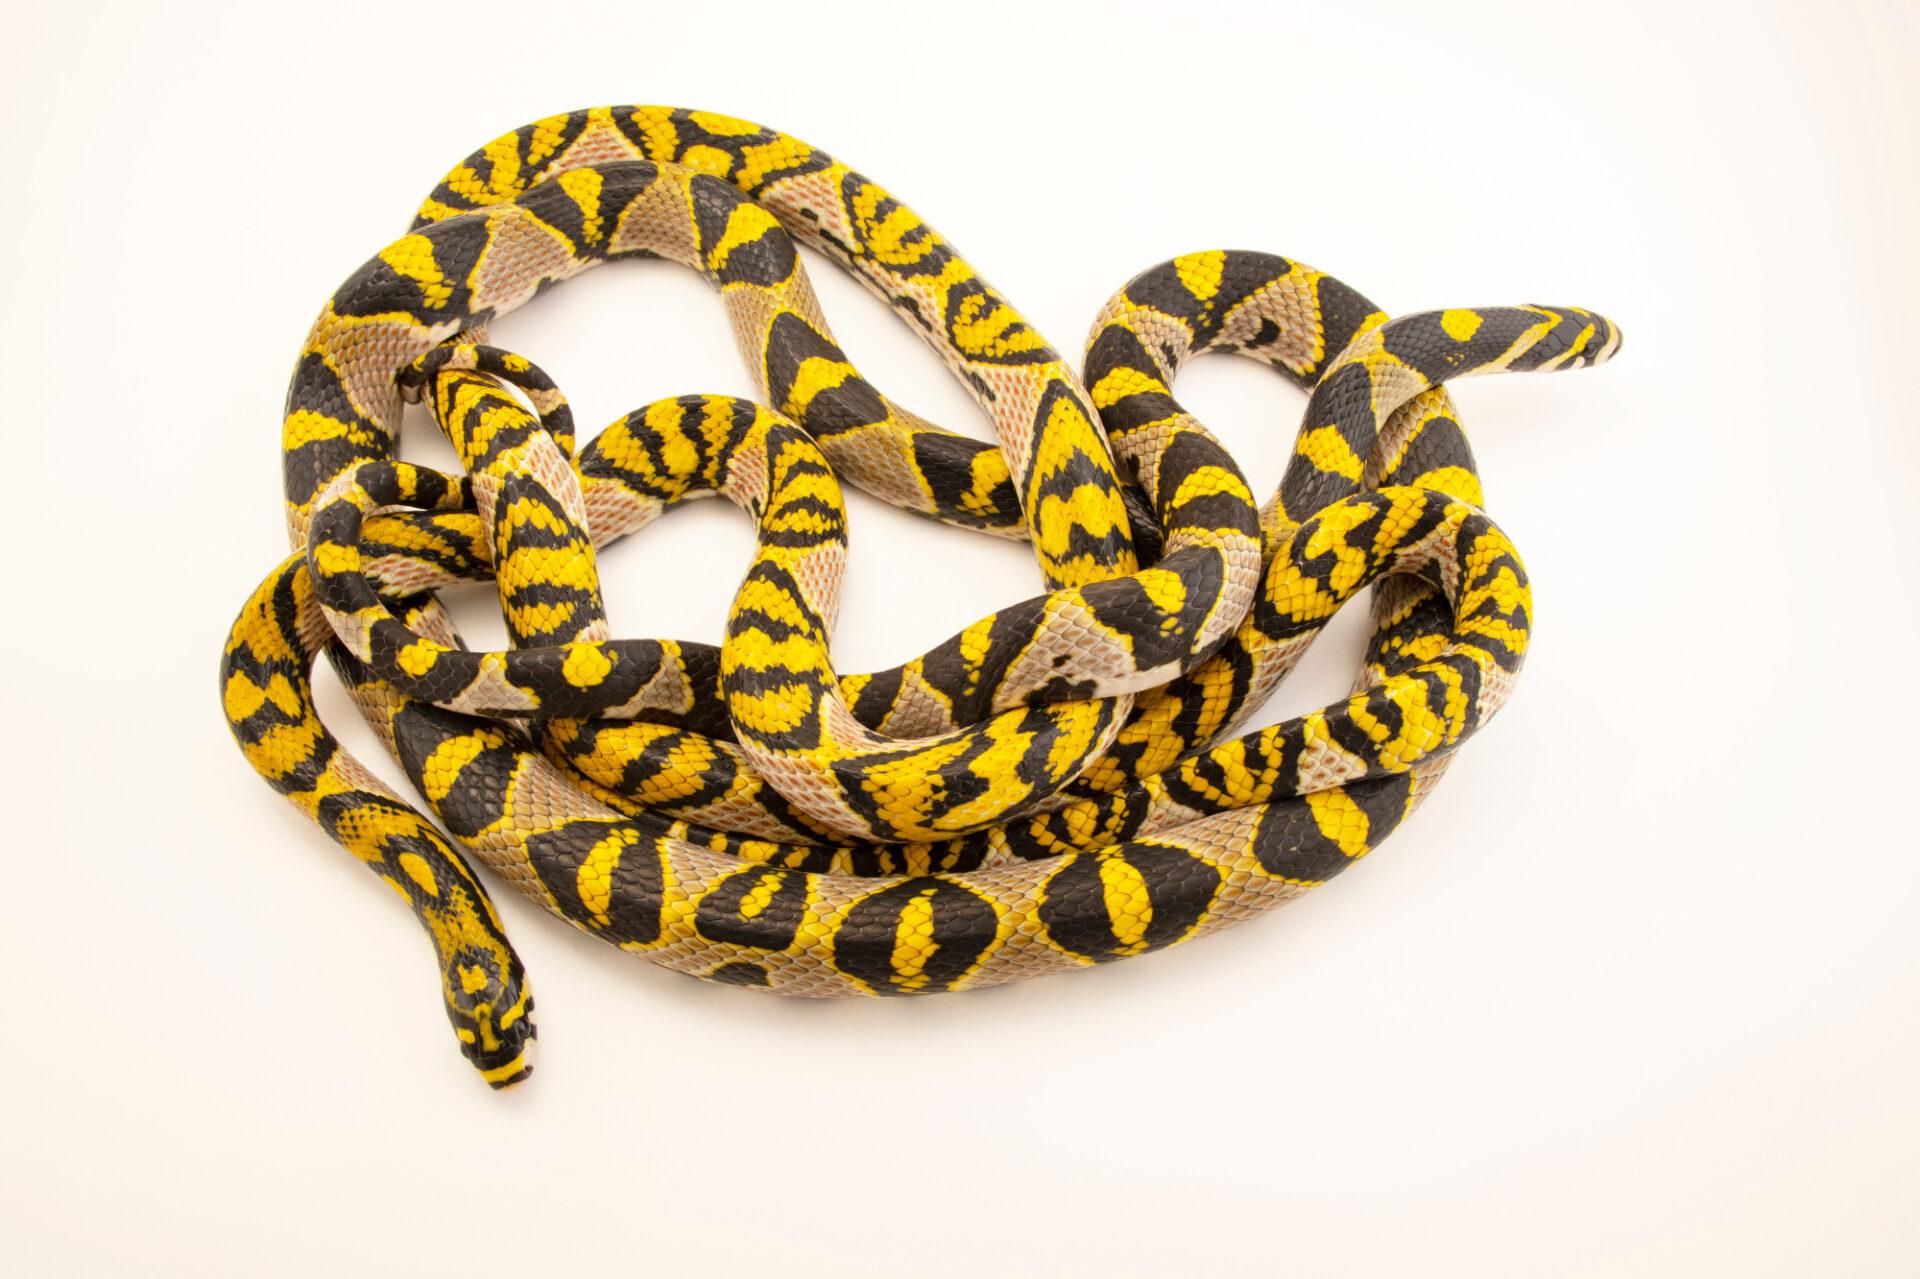 Photo: Two Mandarin trinket snakes (Euprepiophis mandarinus) at Safari Park Dvur Kralove.